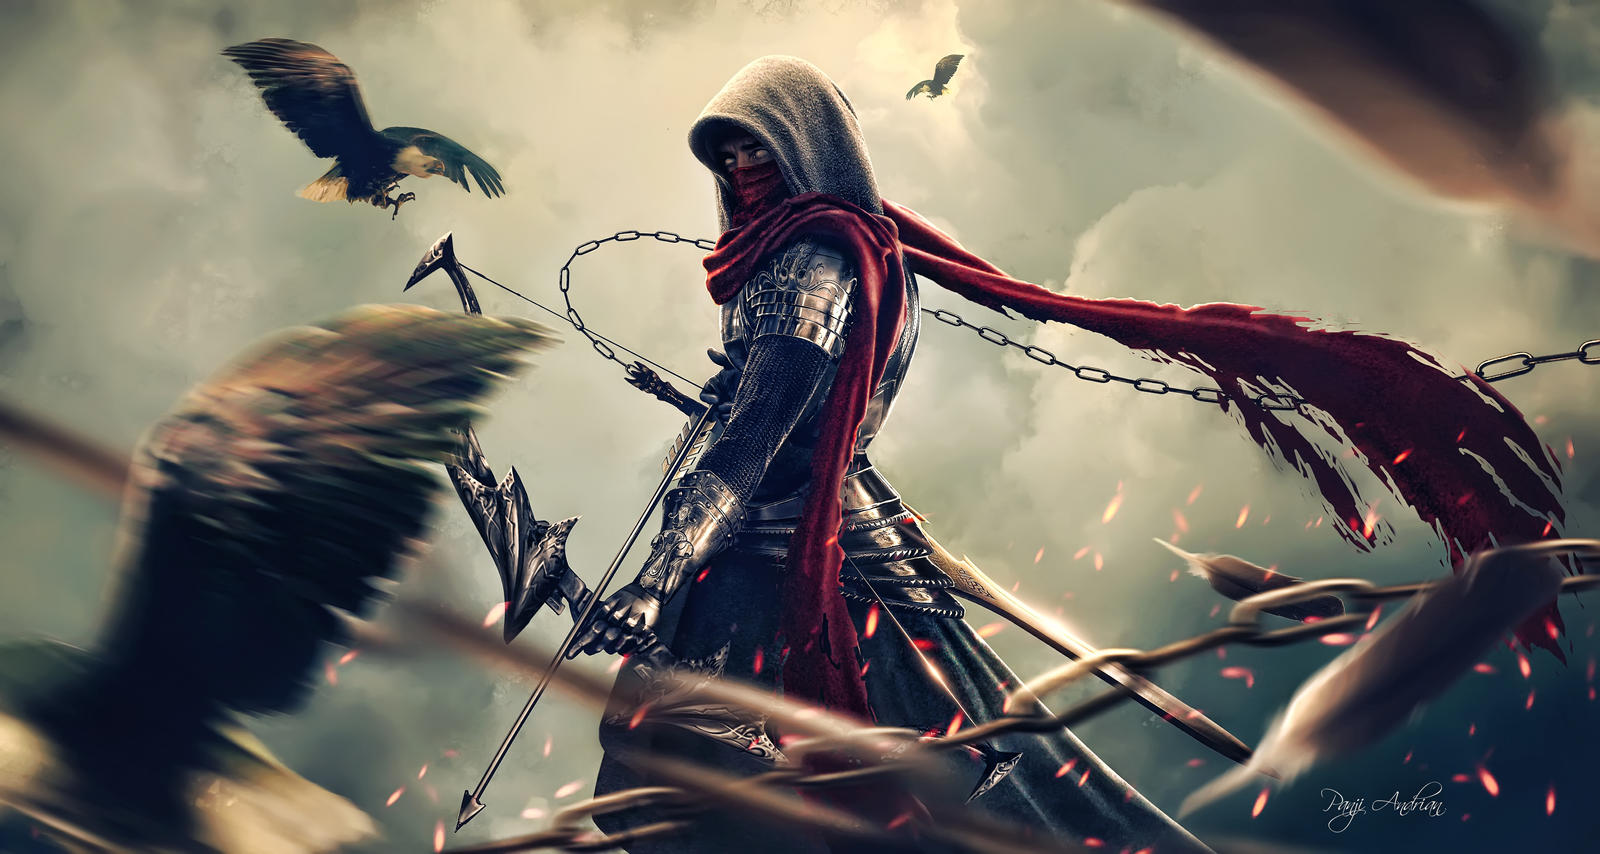 The Eagle Archery